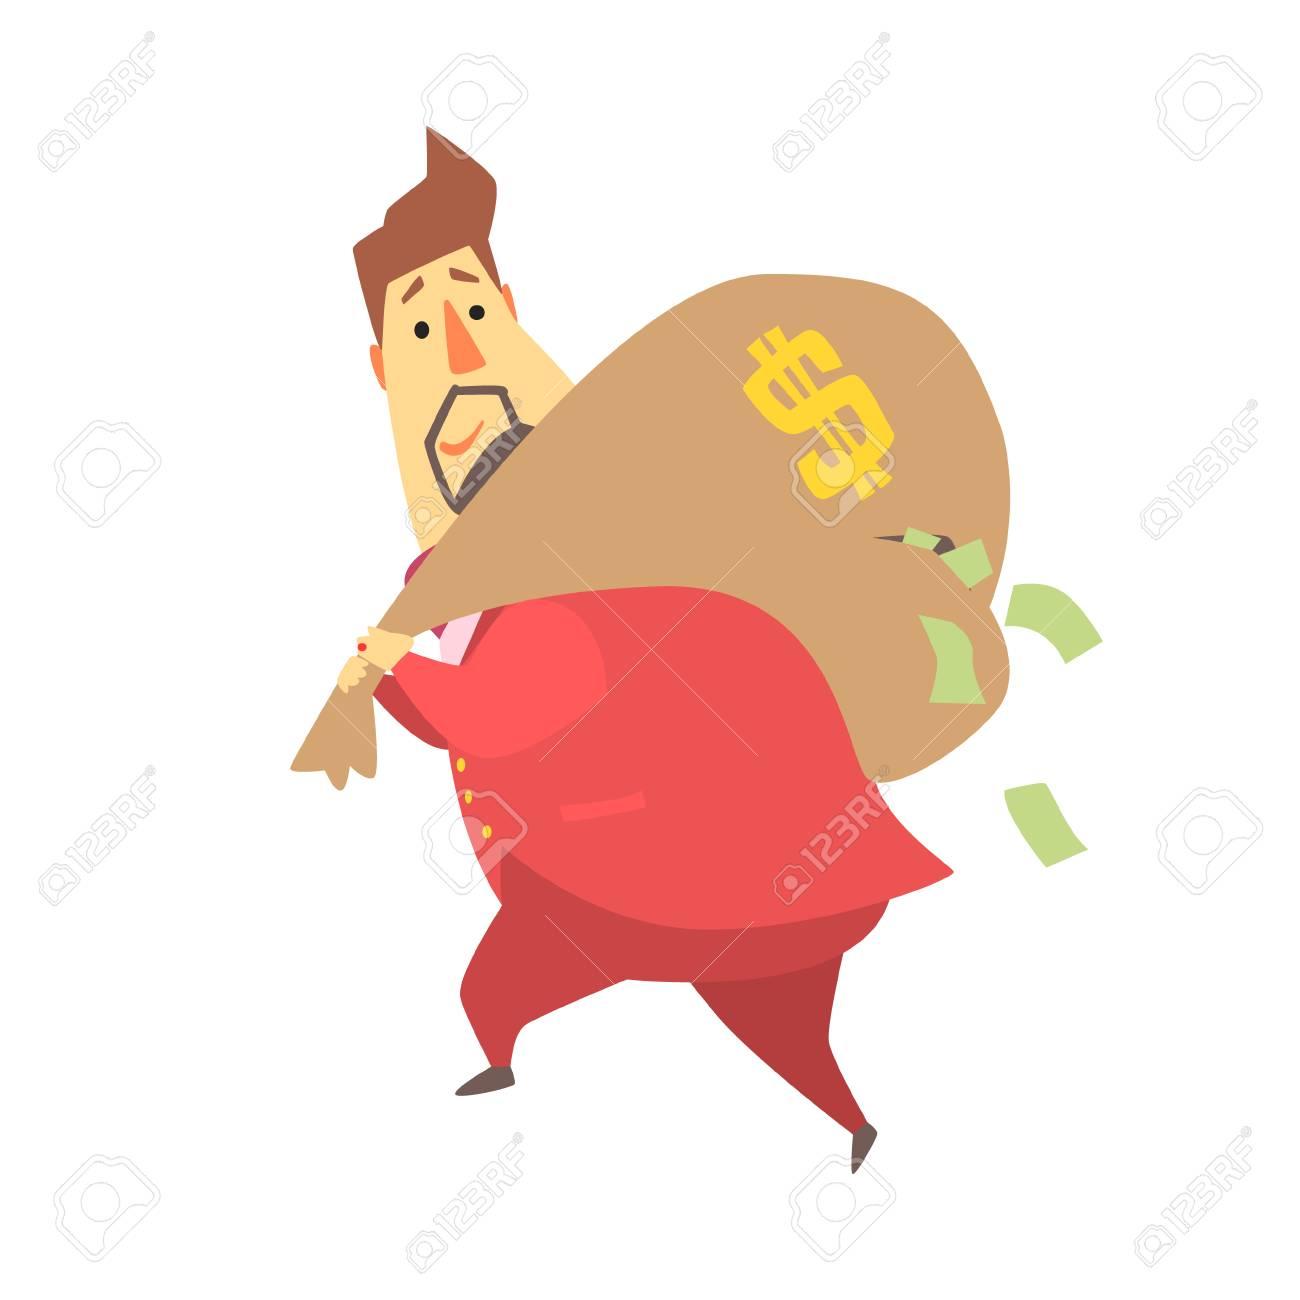 Black Thief Stealing Money Cartoon Vector Clipart - FriendlyStock | Cartoon  boy, Cartoons vector, Cartoon